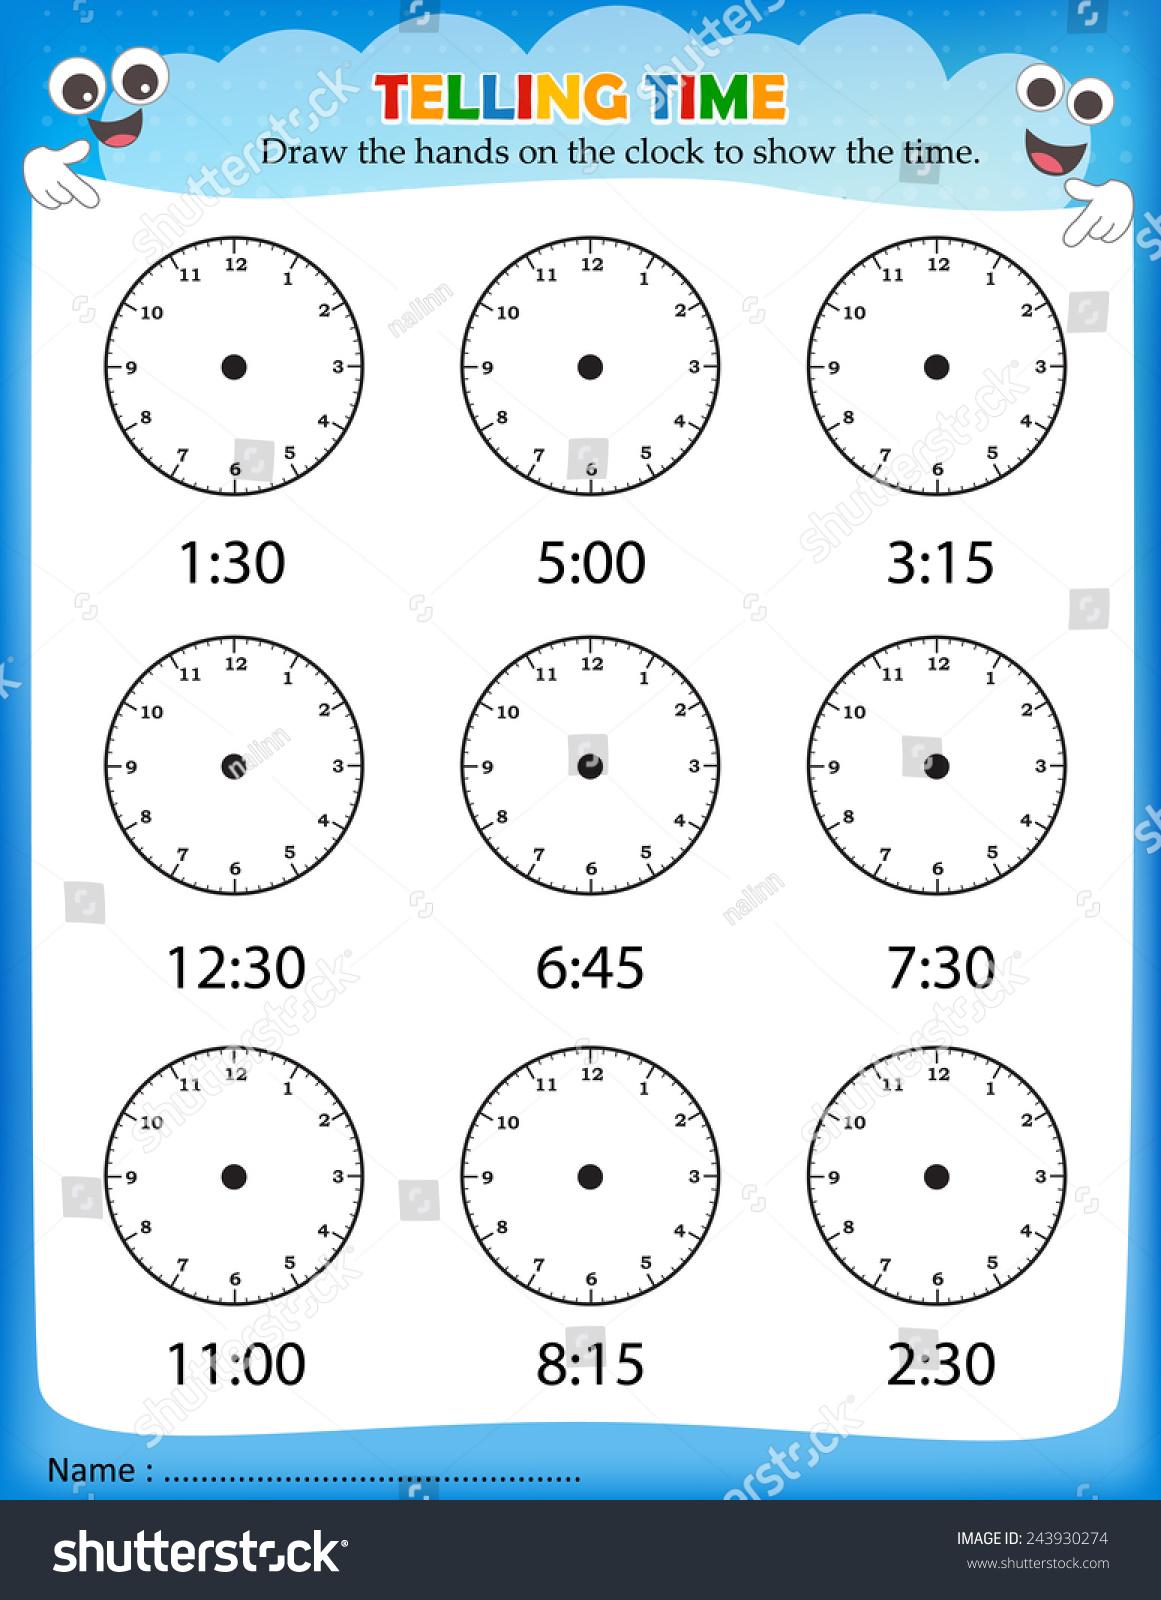 telling time worksheet pre school kids stock vector 243930274 shutterstock. Black Bedroom Furniture Sets. Home Design Ideas